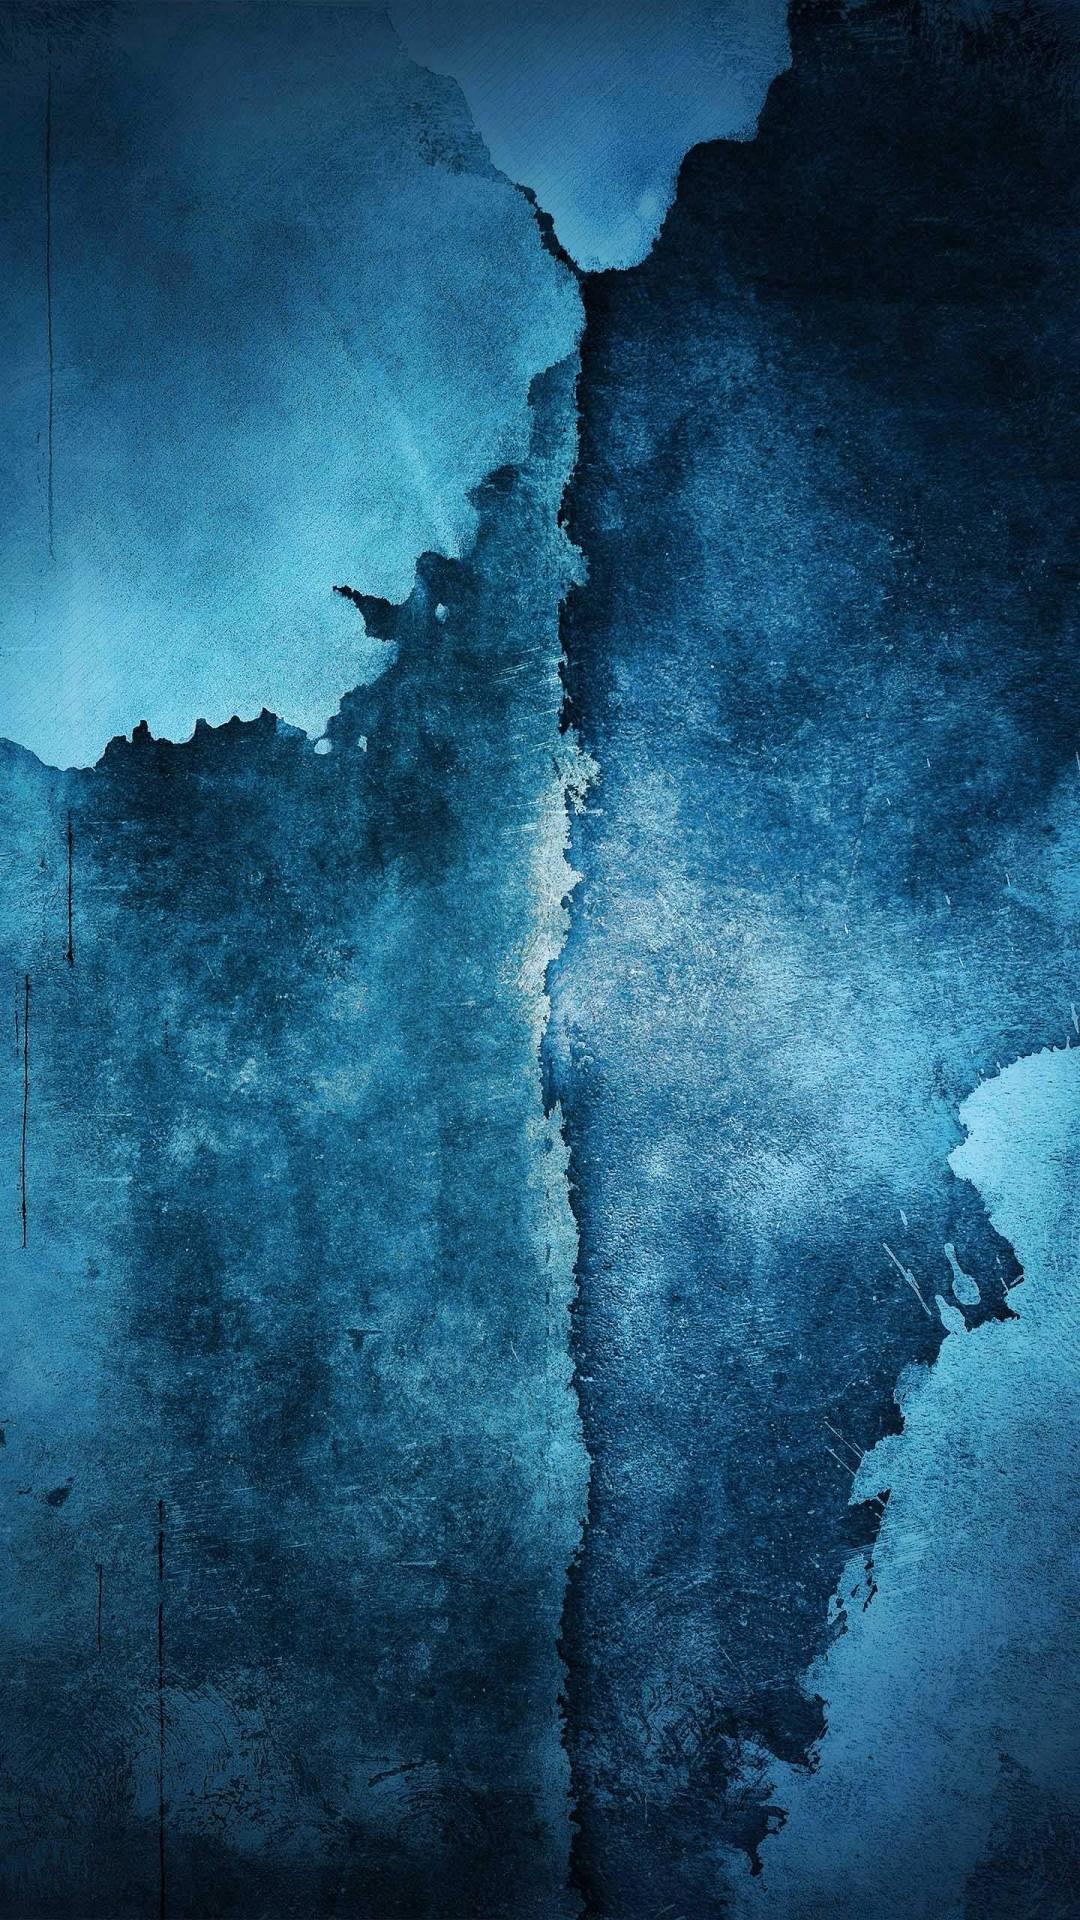 Wallpaper For Iphone ① Download Free Beautiful Full Hd Wallpapers